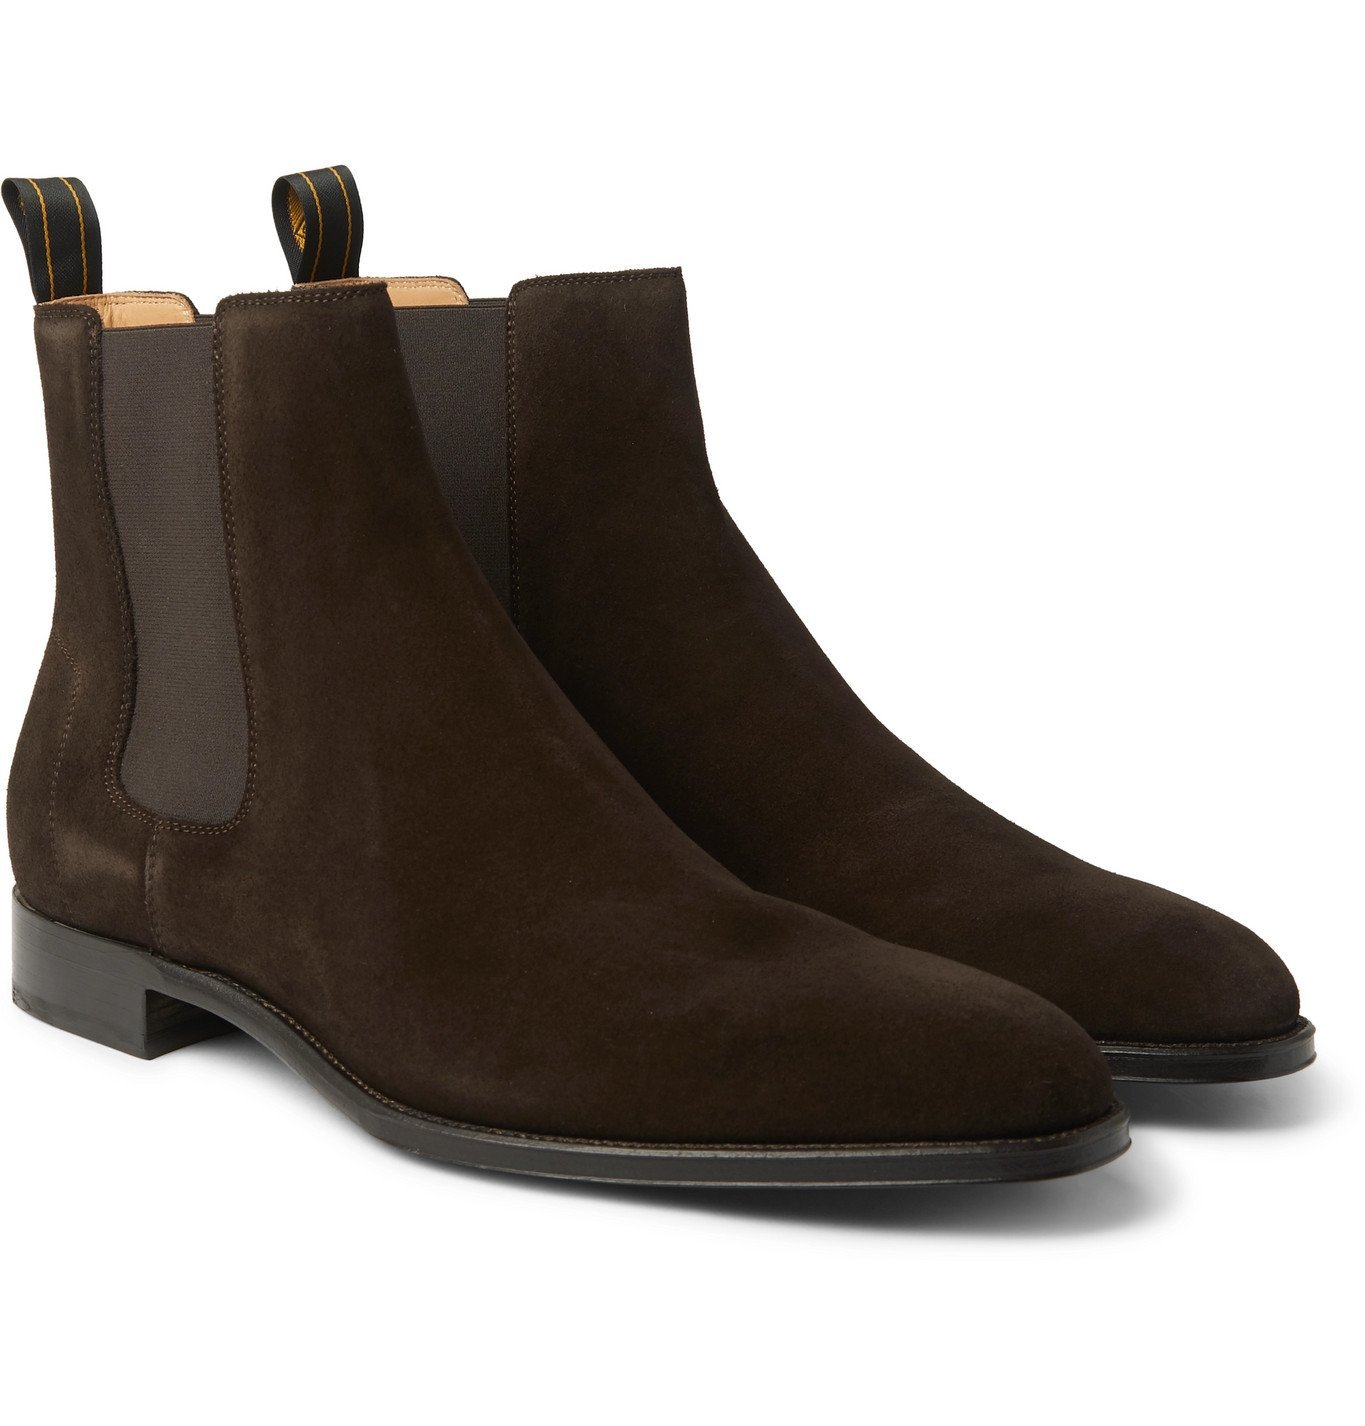 Photo: Dunhill - Kensington Suede Chelsea Boots - Brown